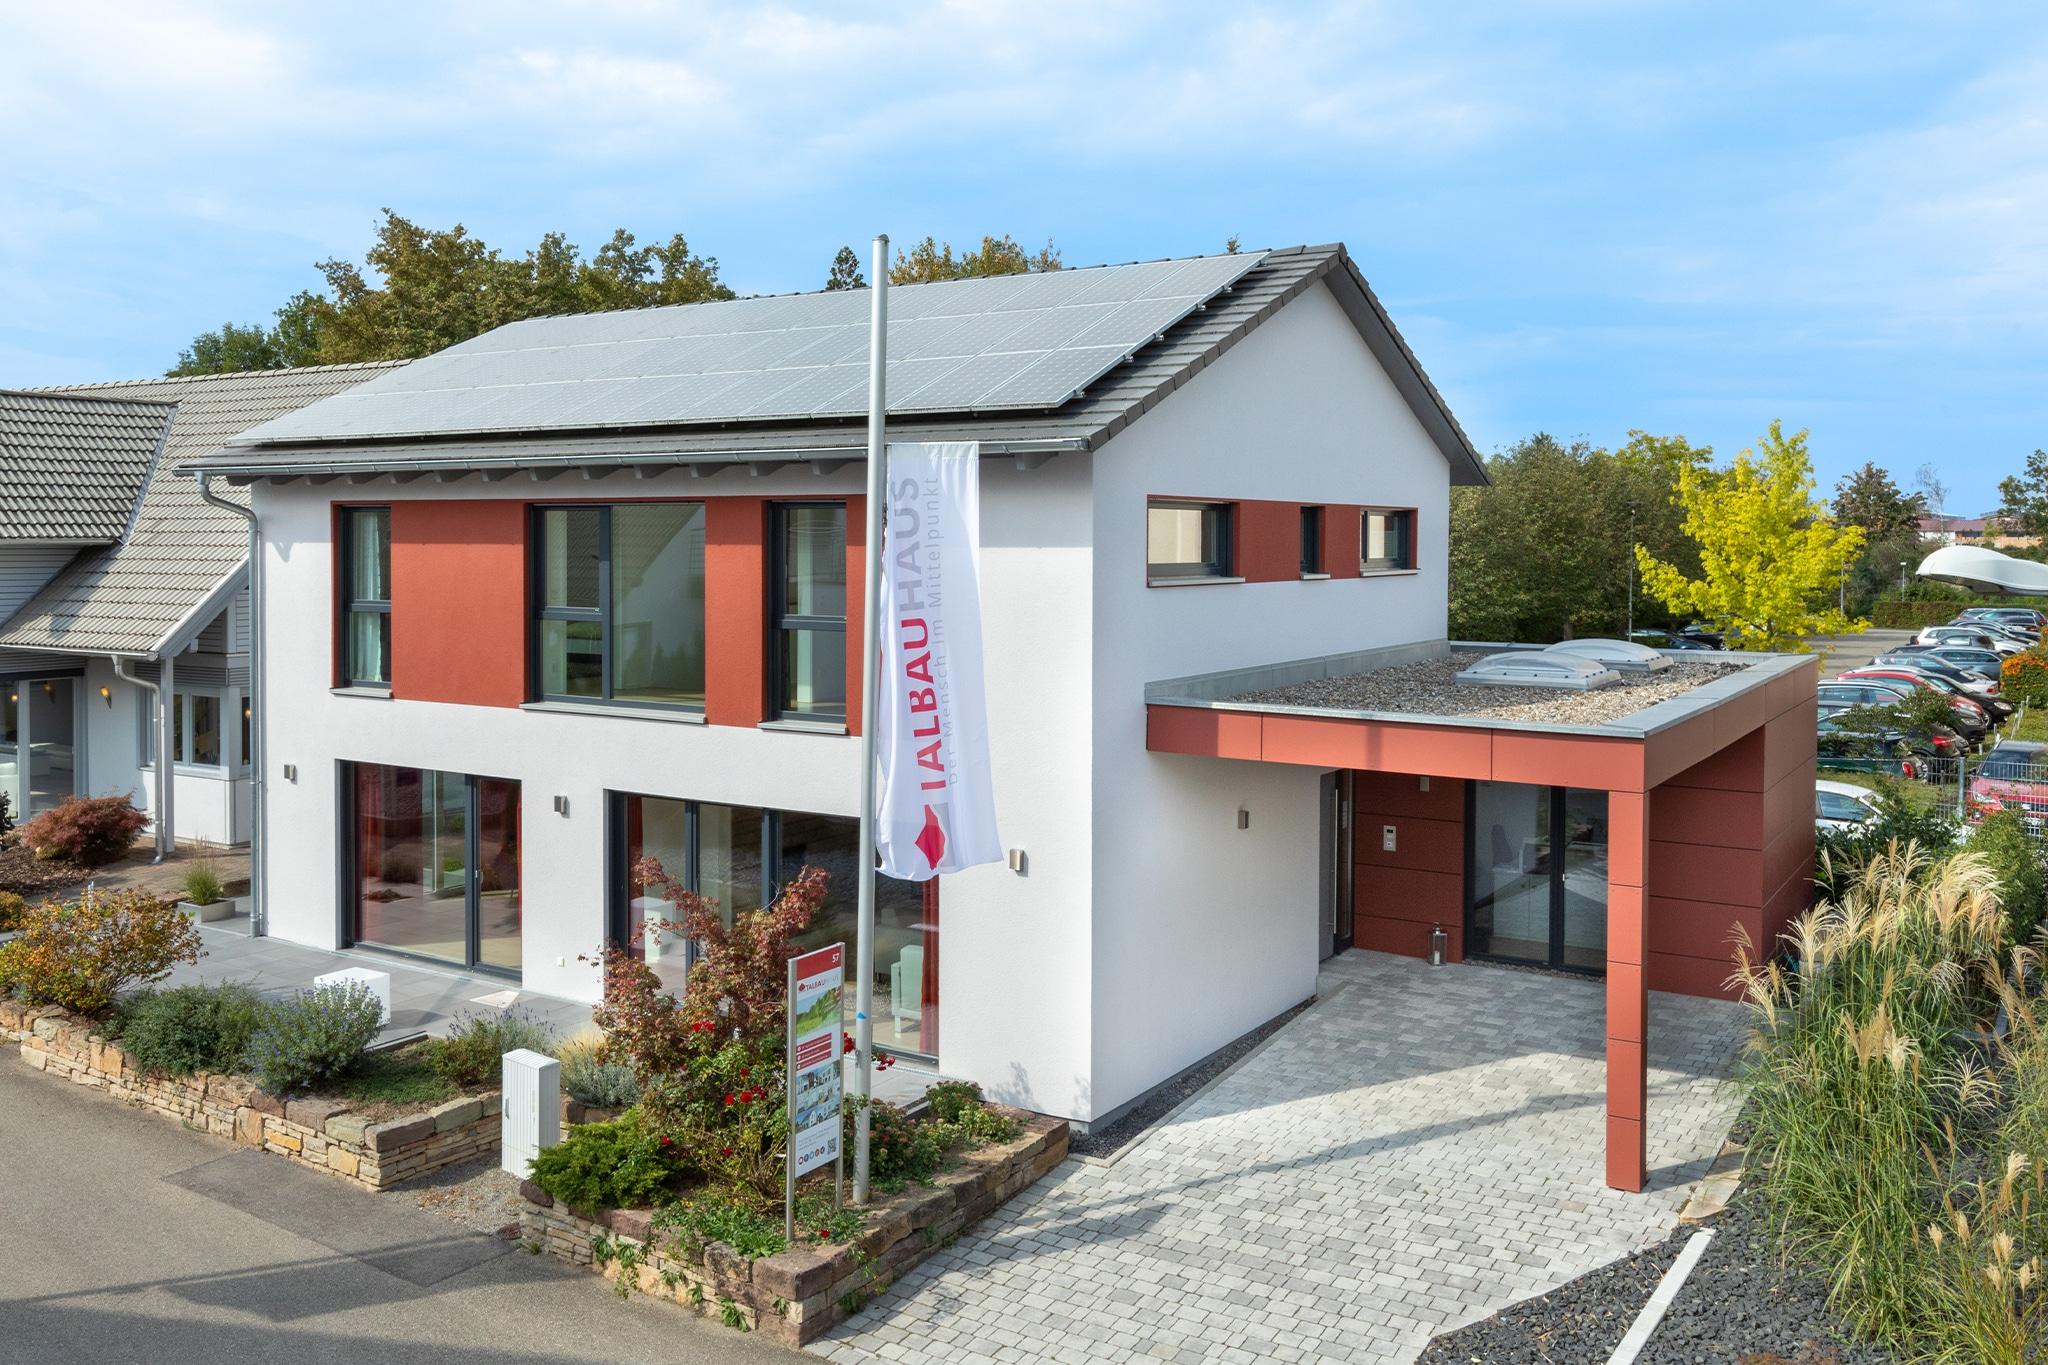 Musterhaus Fellbach Fertighaus Modernes, puristisches Design Talbau-Haus